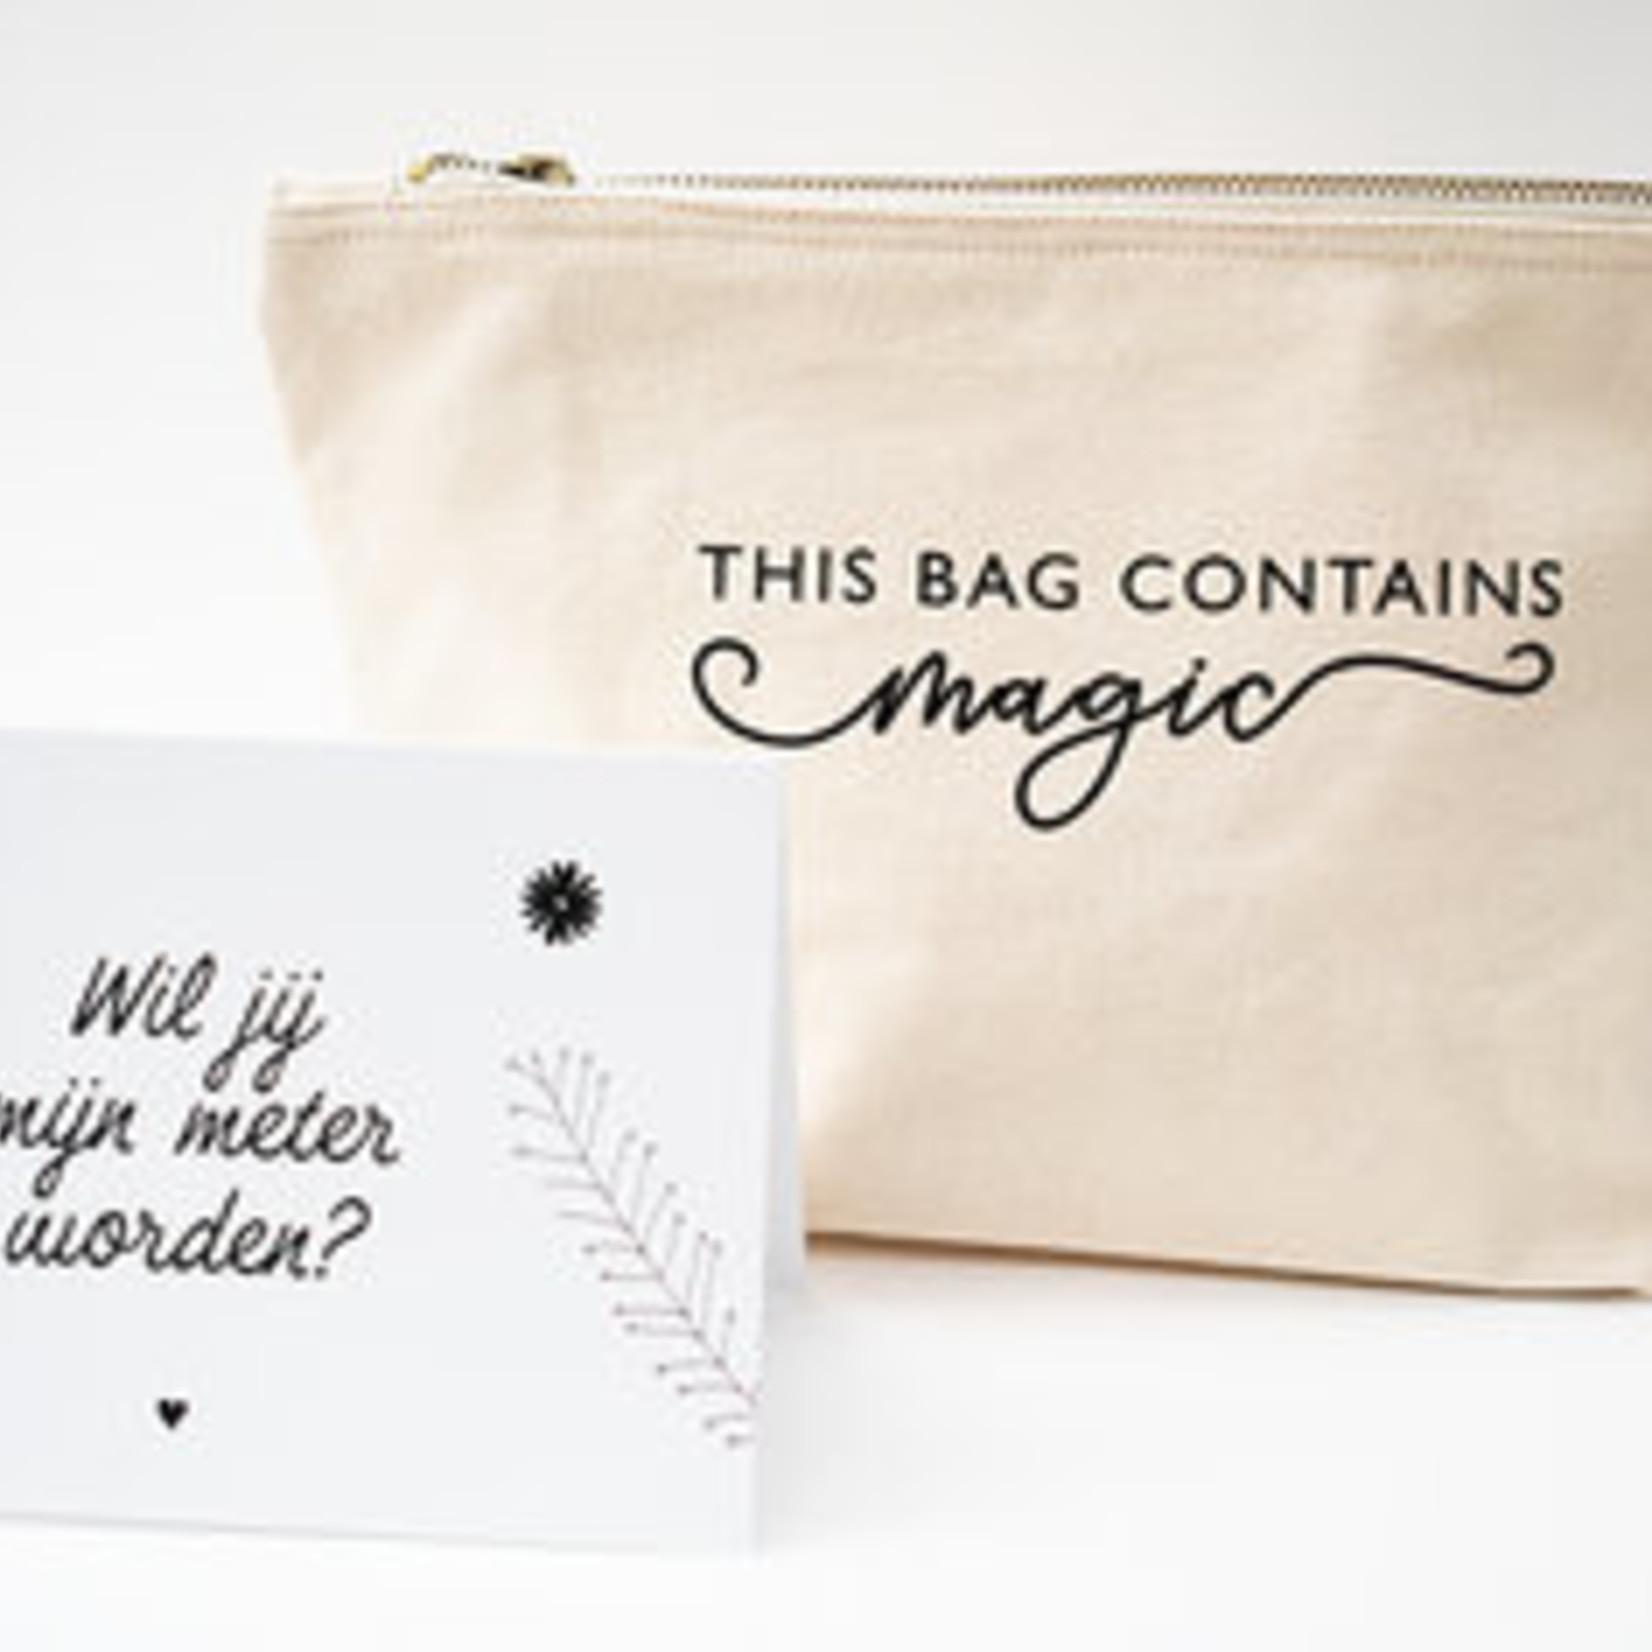 Minimou Minimou Make-up tasje 'There's magic inside' met kaartje 'Wil jij mijn meter worden?'